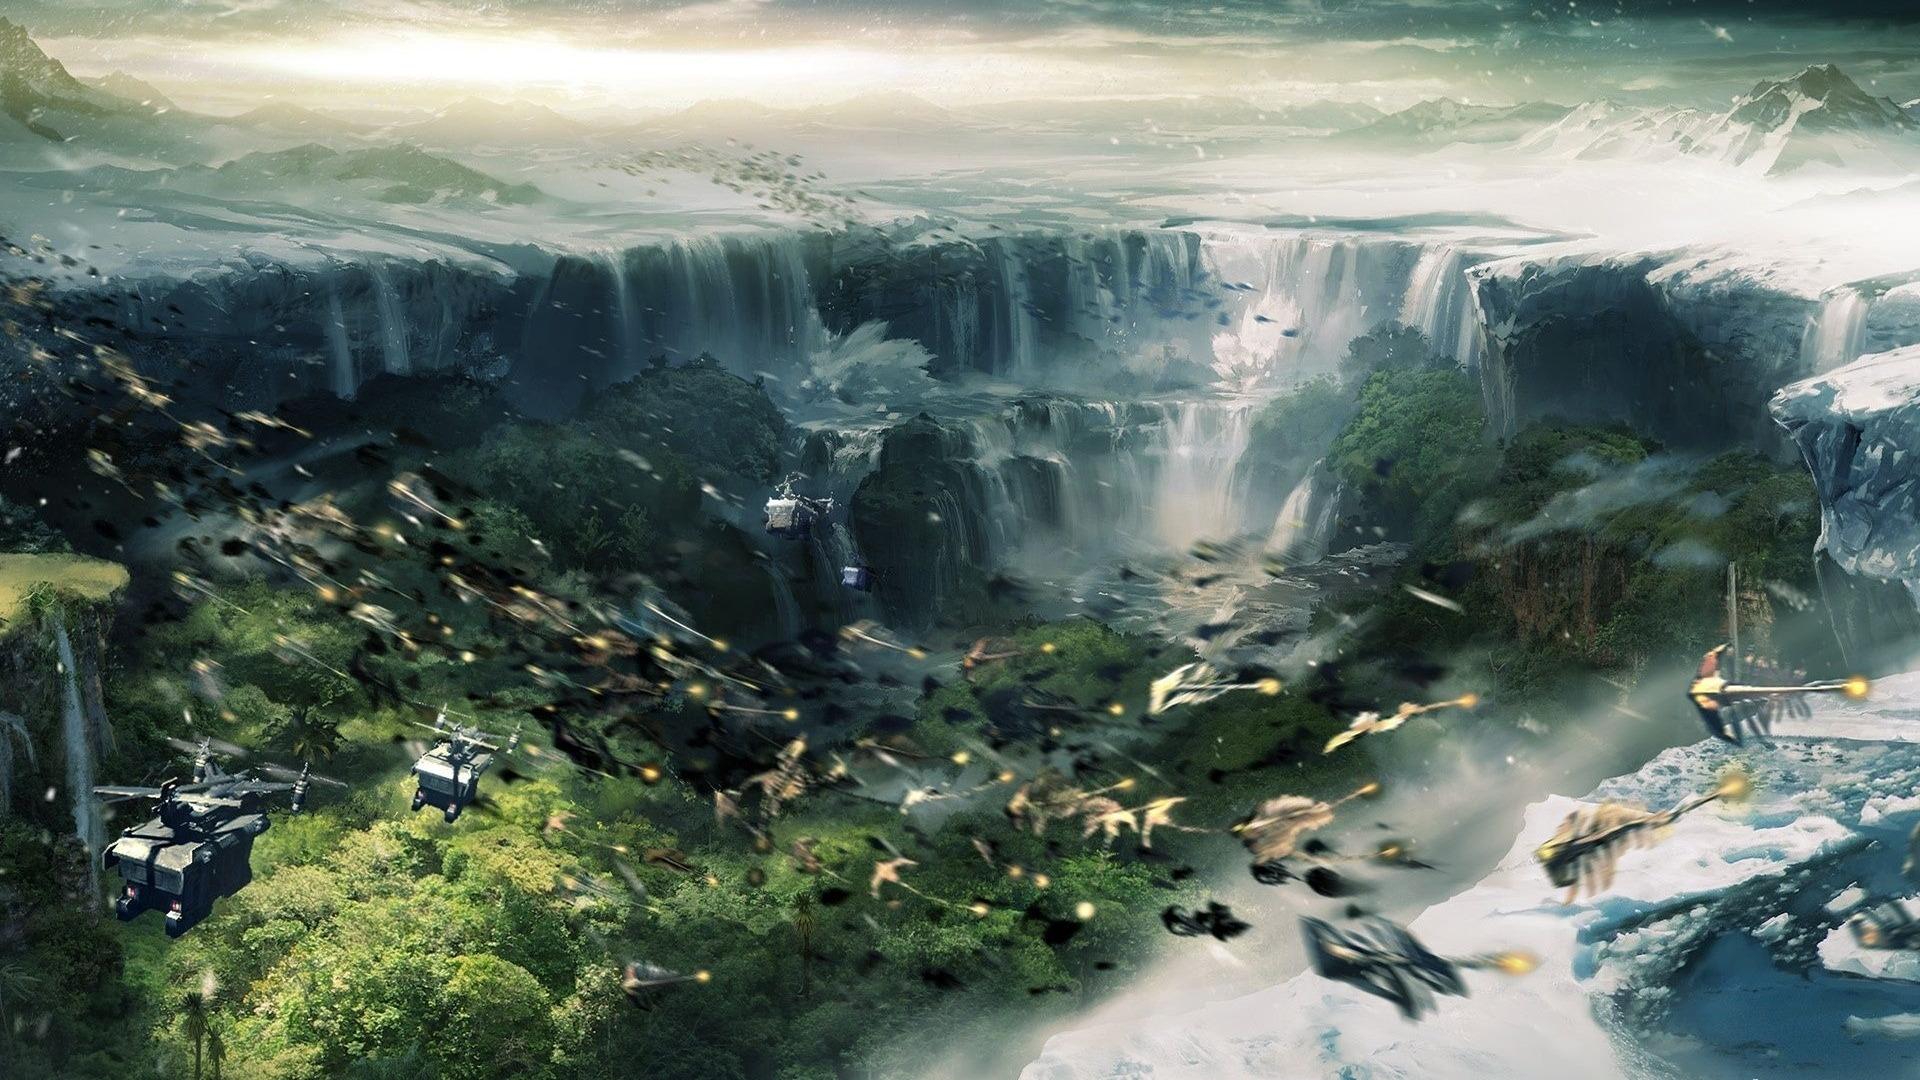 Lost Planet 2 Hd Game Wallpaper Preview 10wallpaper Com